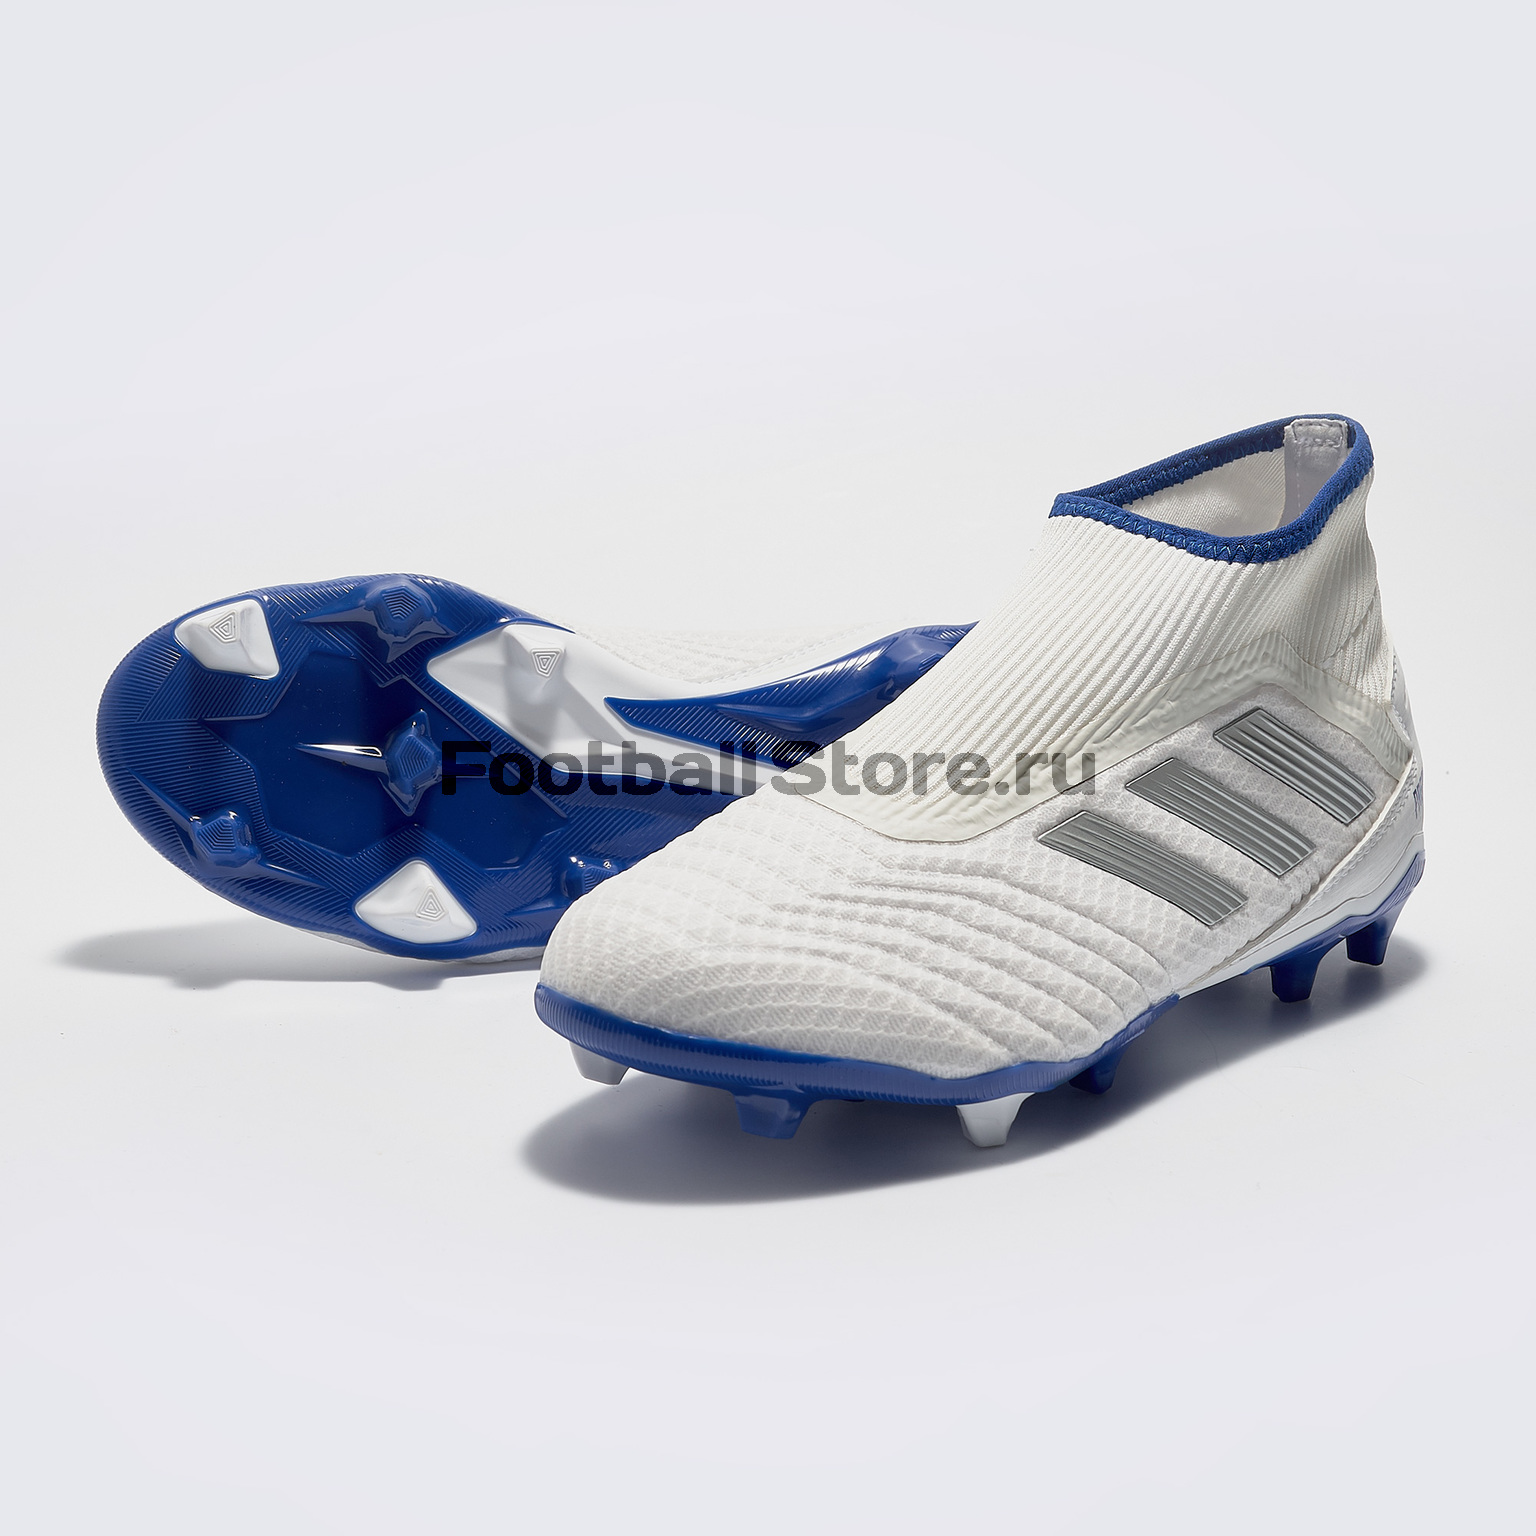 Бутсы Adidas Predator 19.3 LL FG F99729